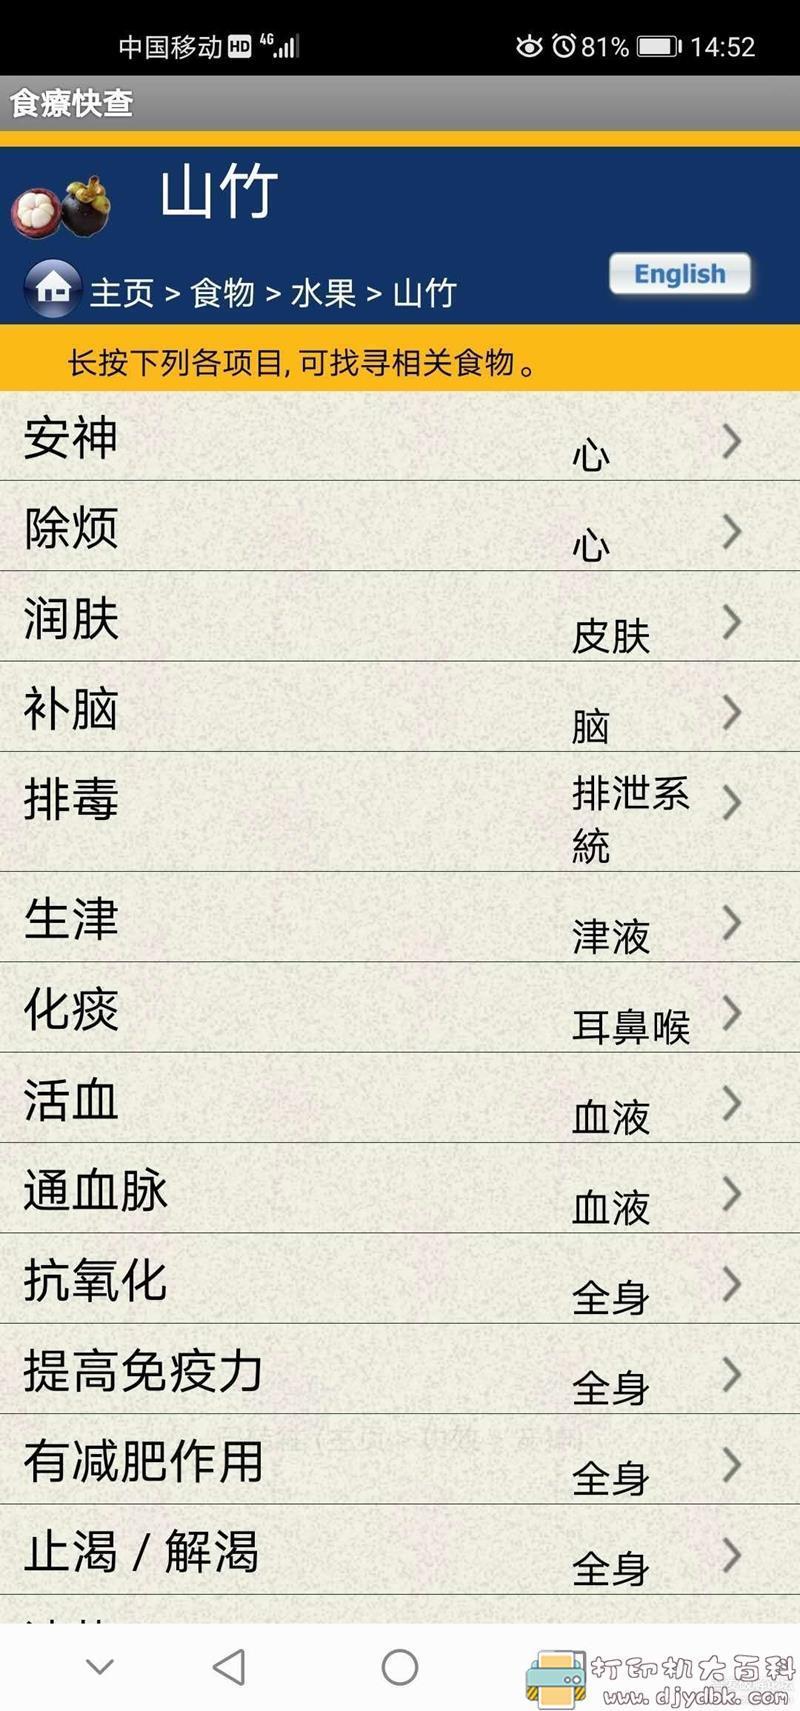 [Android]养生系列【食疗快查app】了解你吃的食物的特性图片 No.7